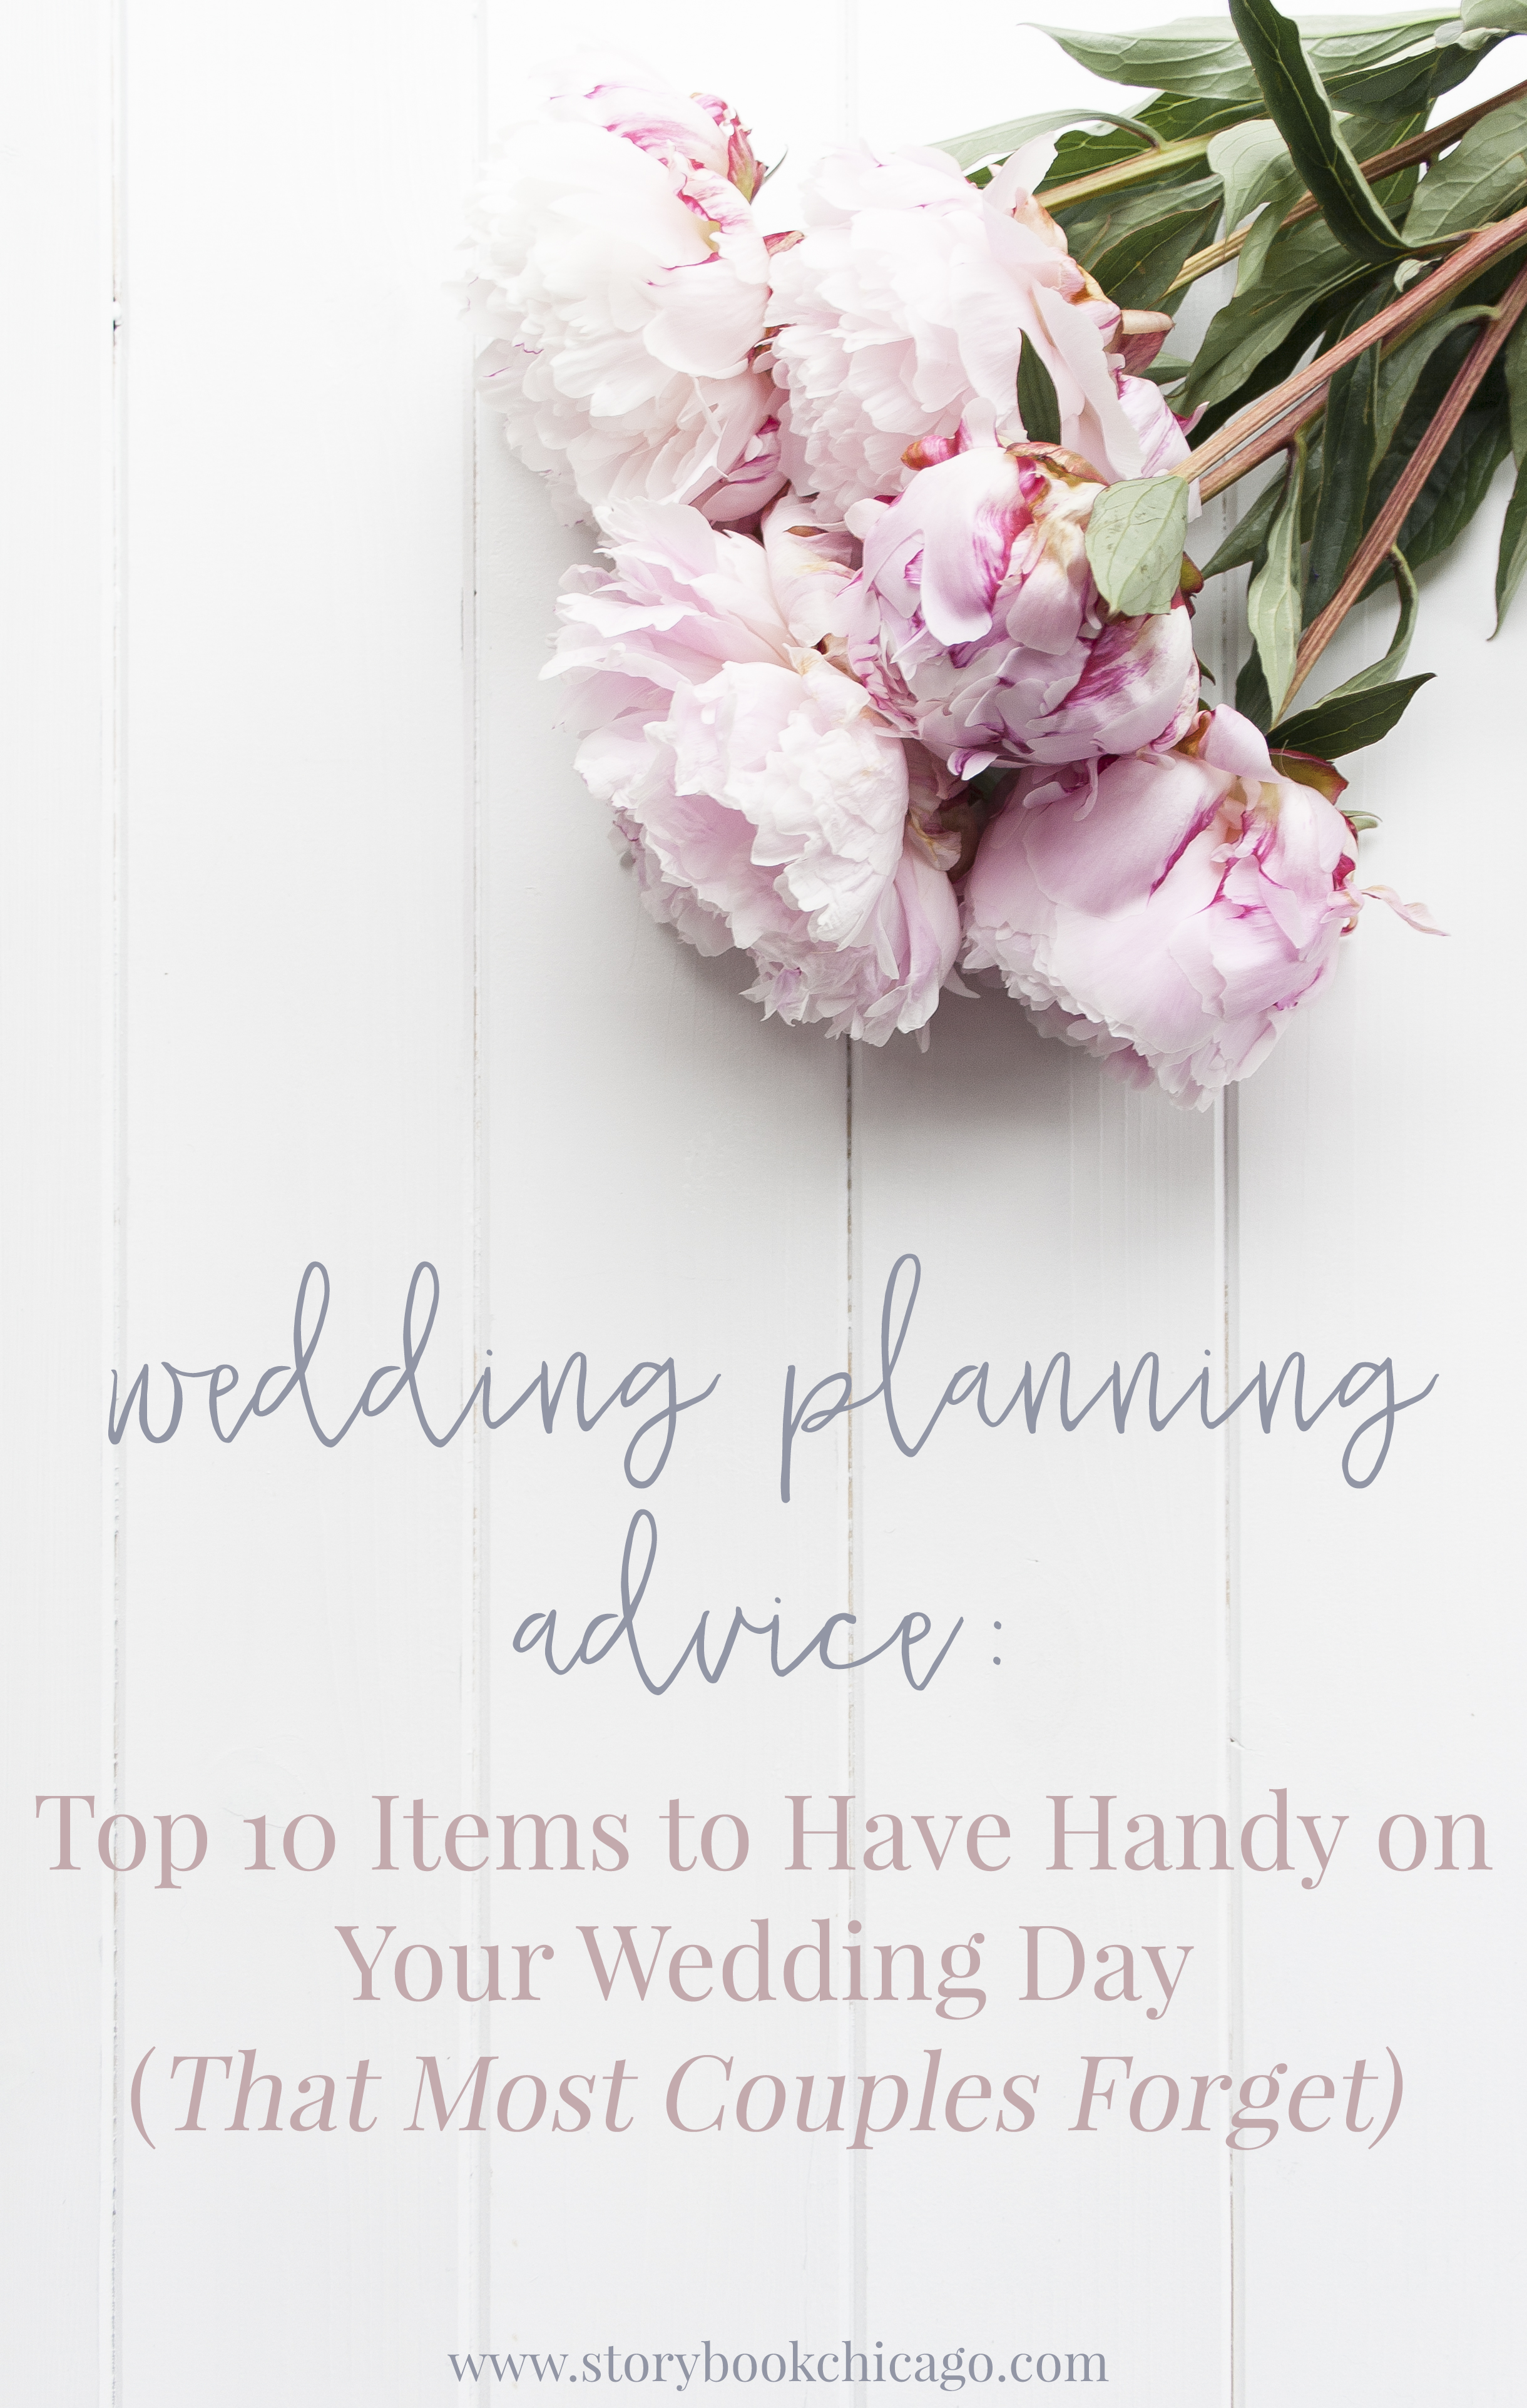 Handy Wedding Items | Wedding Planning 101 | Pinterest | Wedding ...